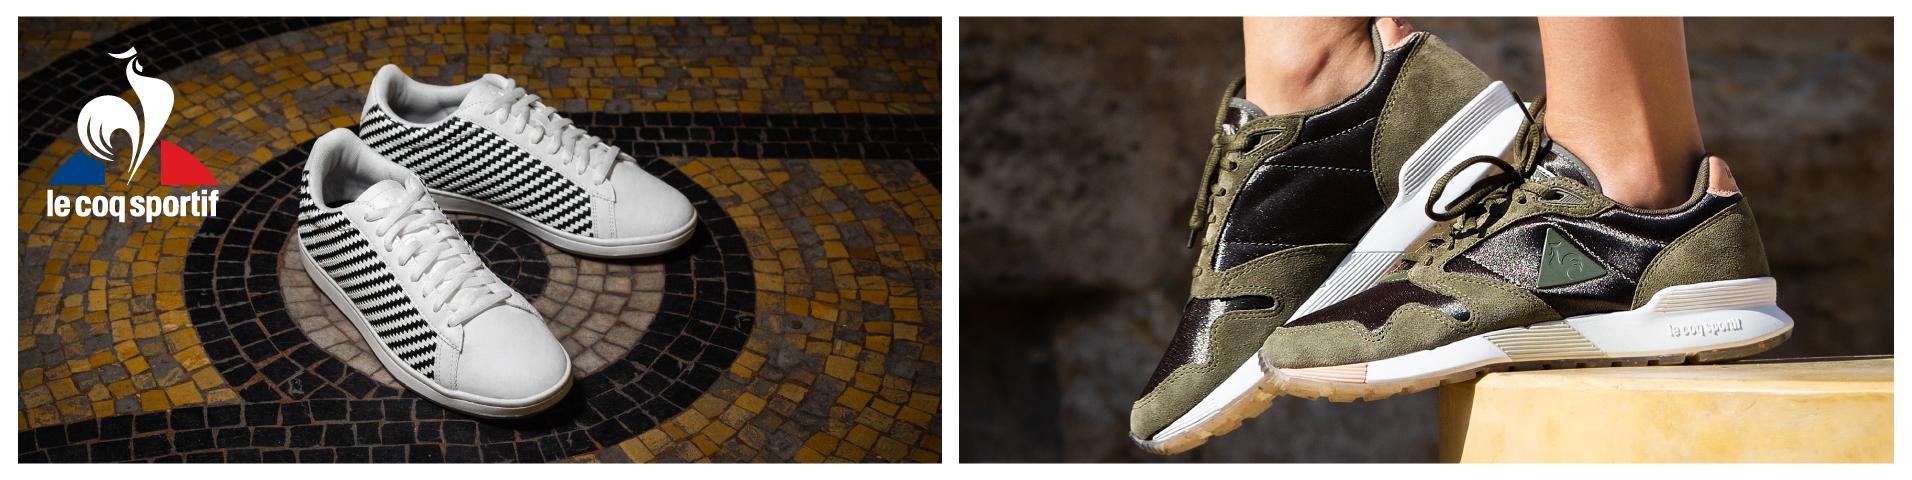 06964fbd43ad Sneakers femme de le coq sportif